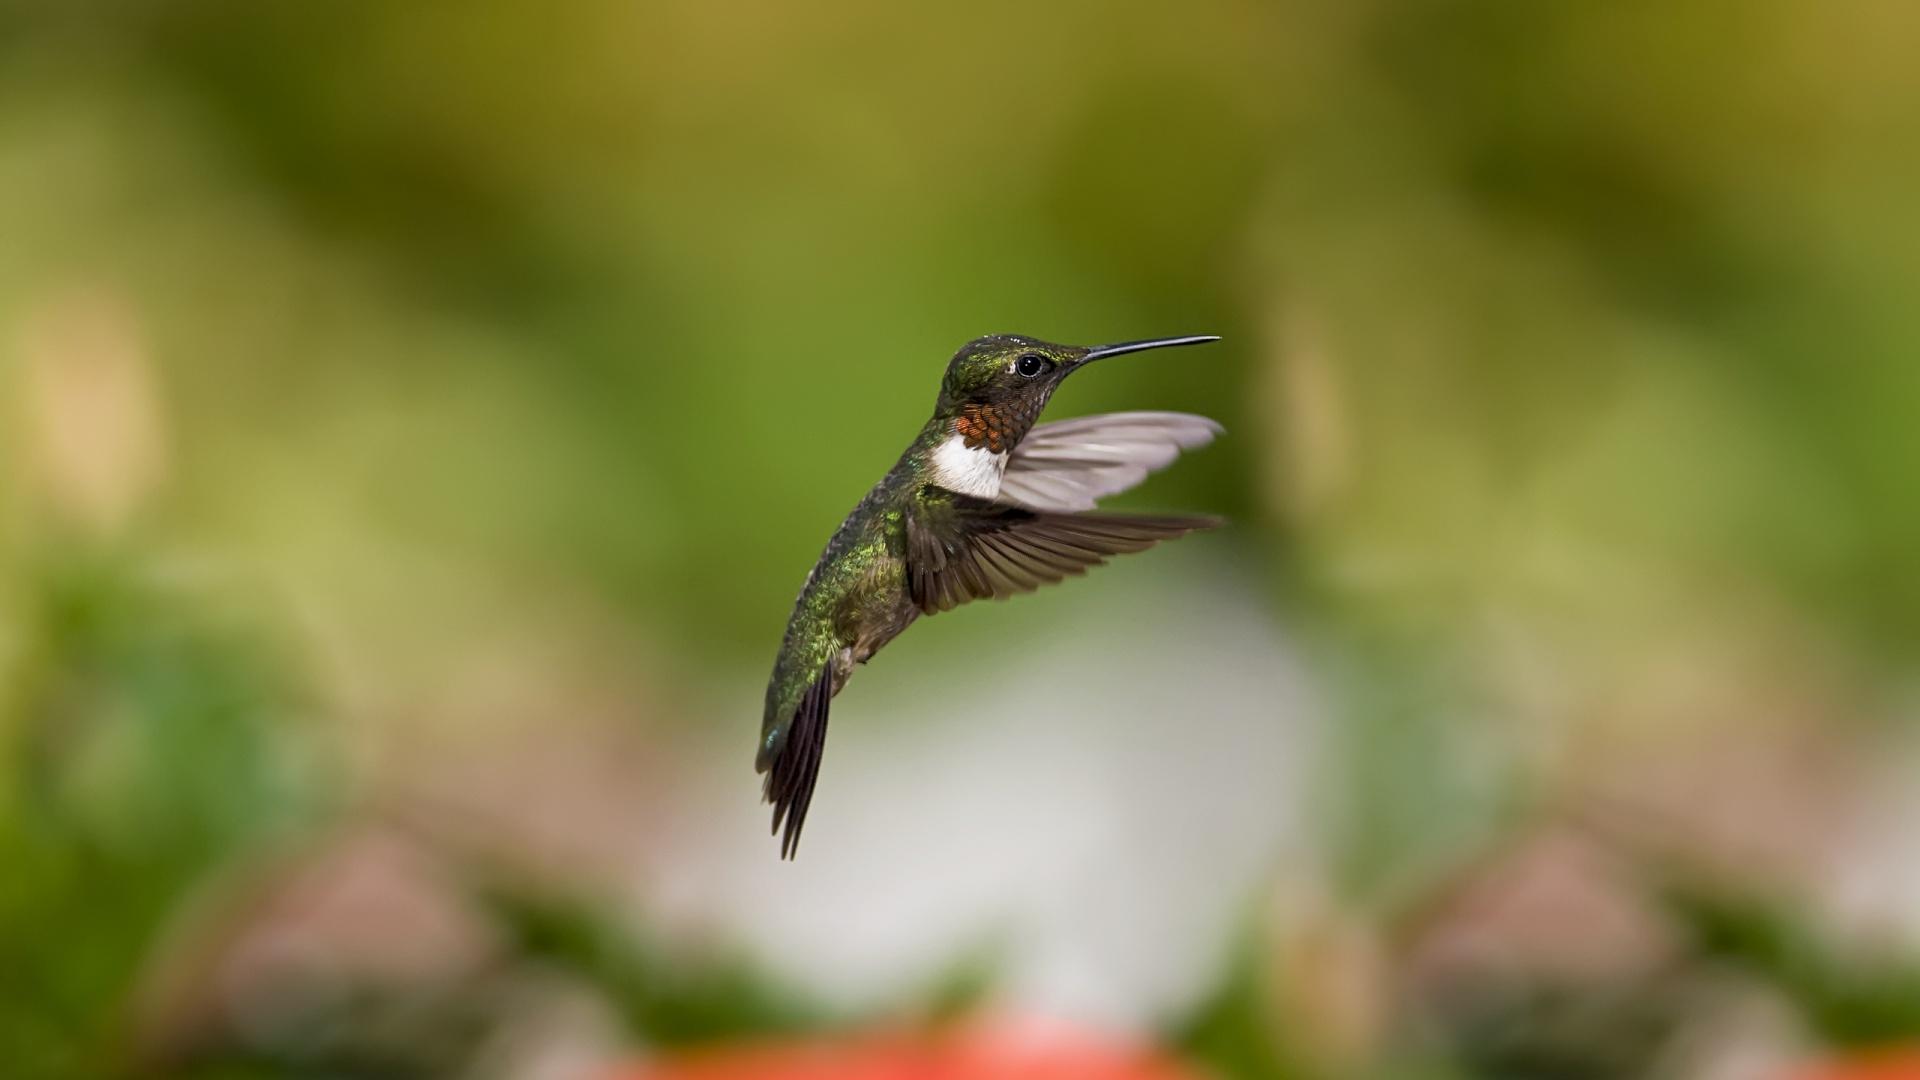 hummingbird wallpaper download